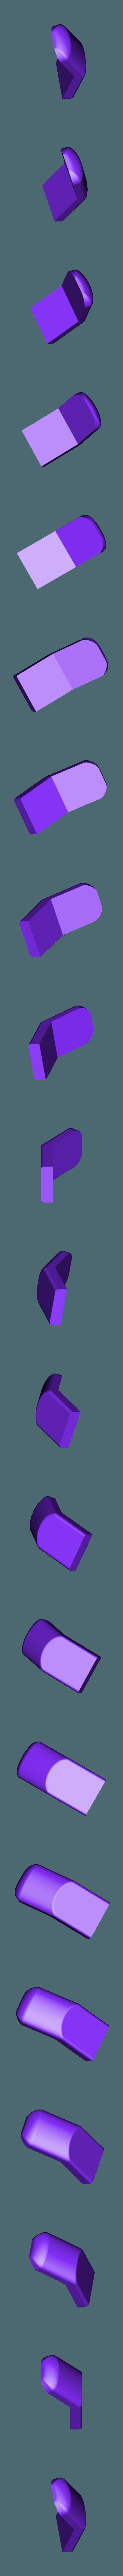 Part5-3.STL Download STL file Tracer pulse bomb. • 3D printable design, Cosple